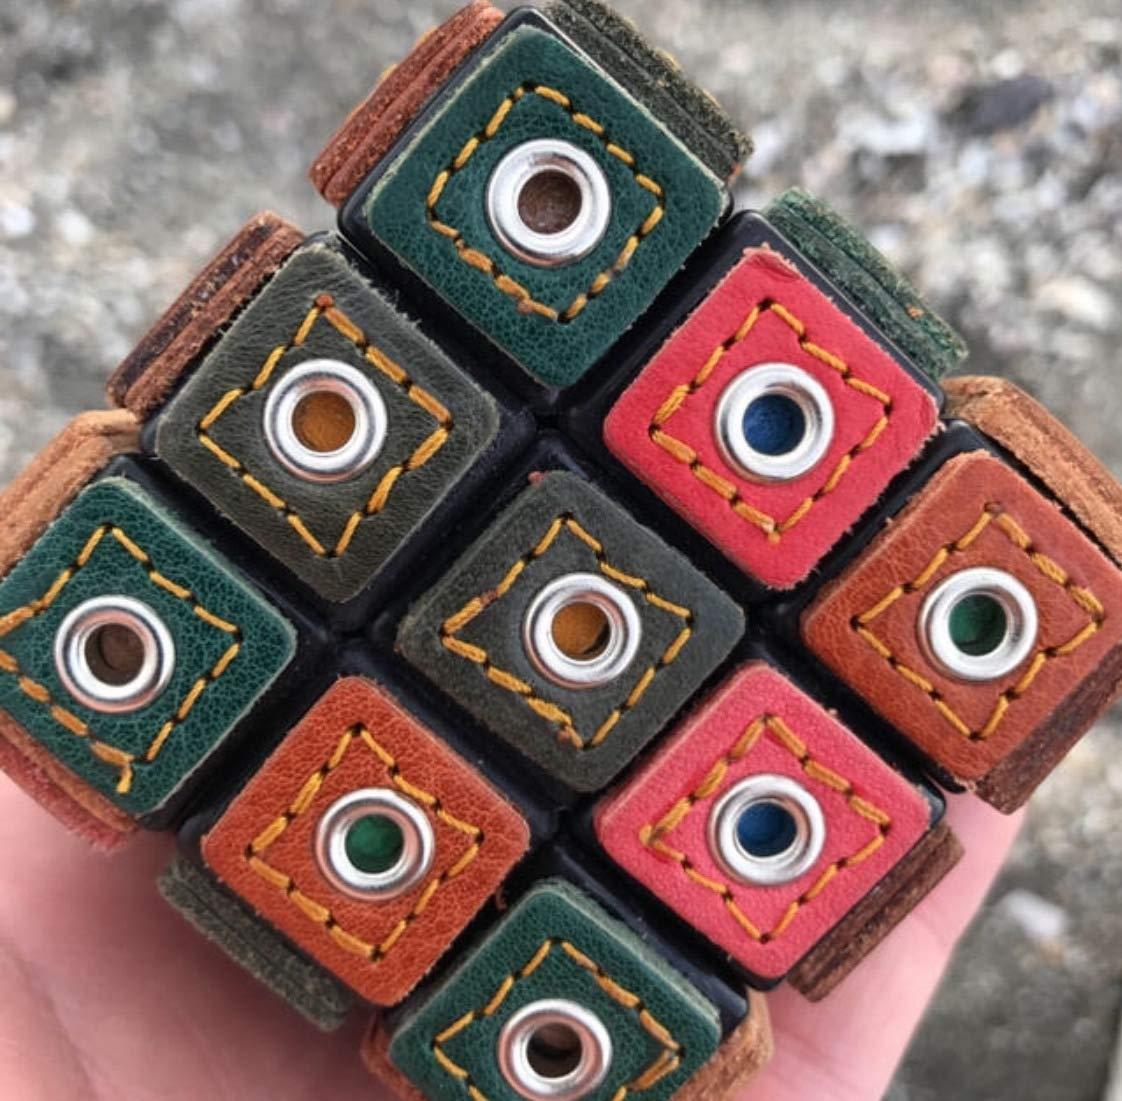 Rubik`s Cube ルービックキューブ 手作り Rubik`s Cube おもちゃ B07PHLTNJR 皮素材 B07PHLTNJR, とっぷりさいくるモール:04a9f2a3 --- m2cweb.com